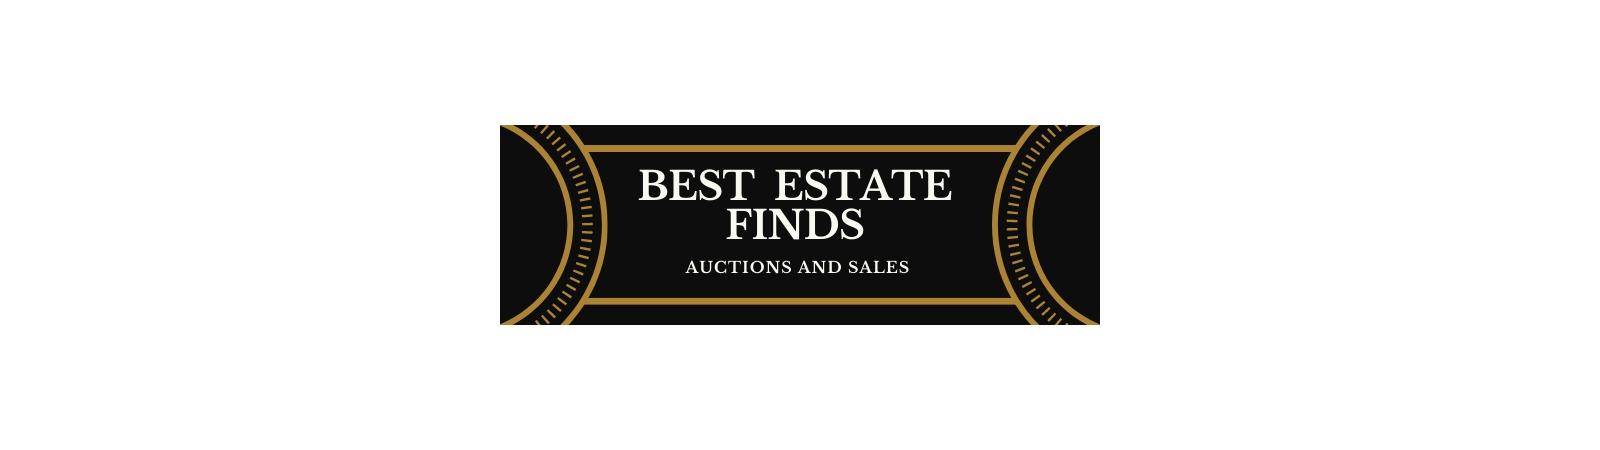 Best Estate and Tag Sales, LLC | Auction Ninja